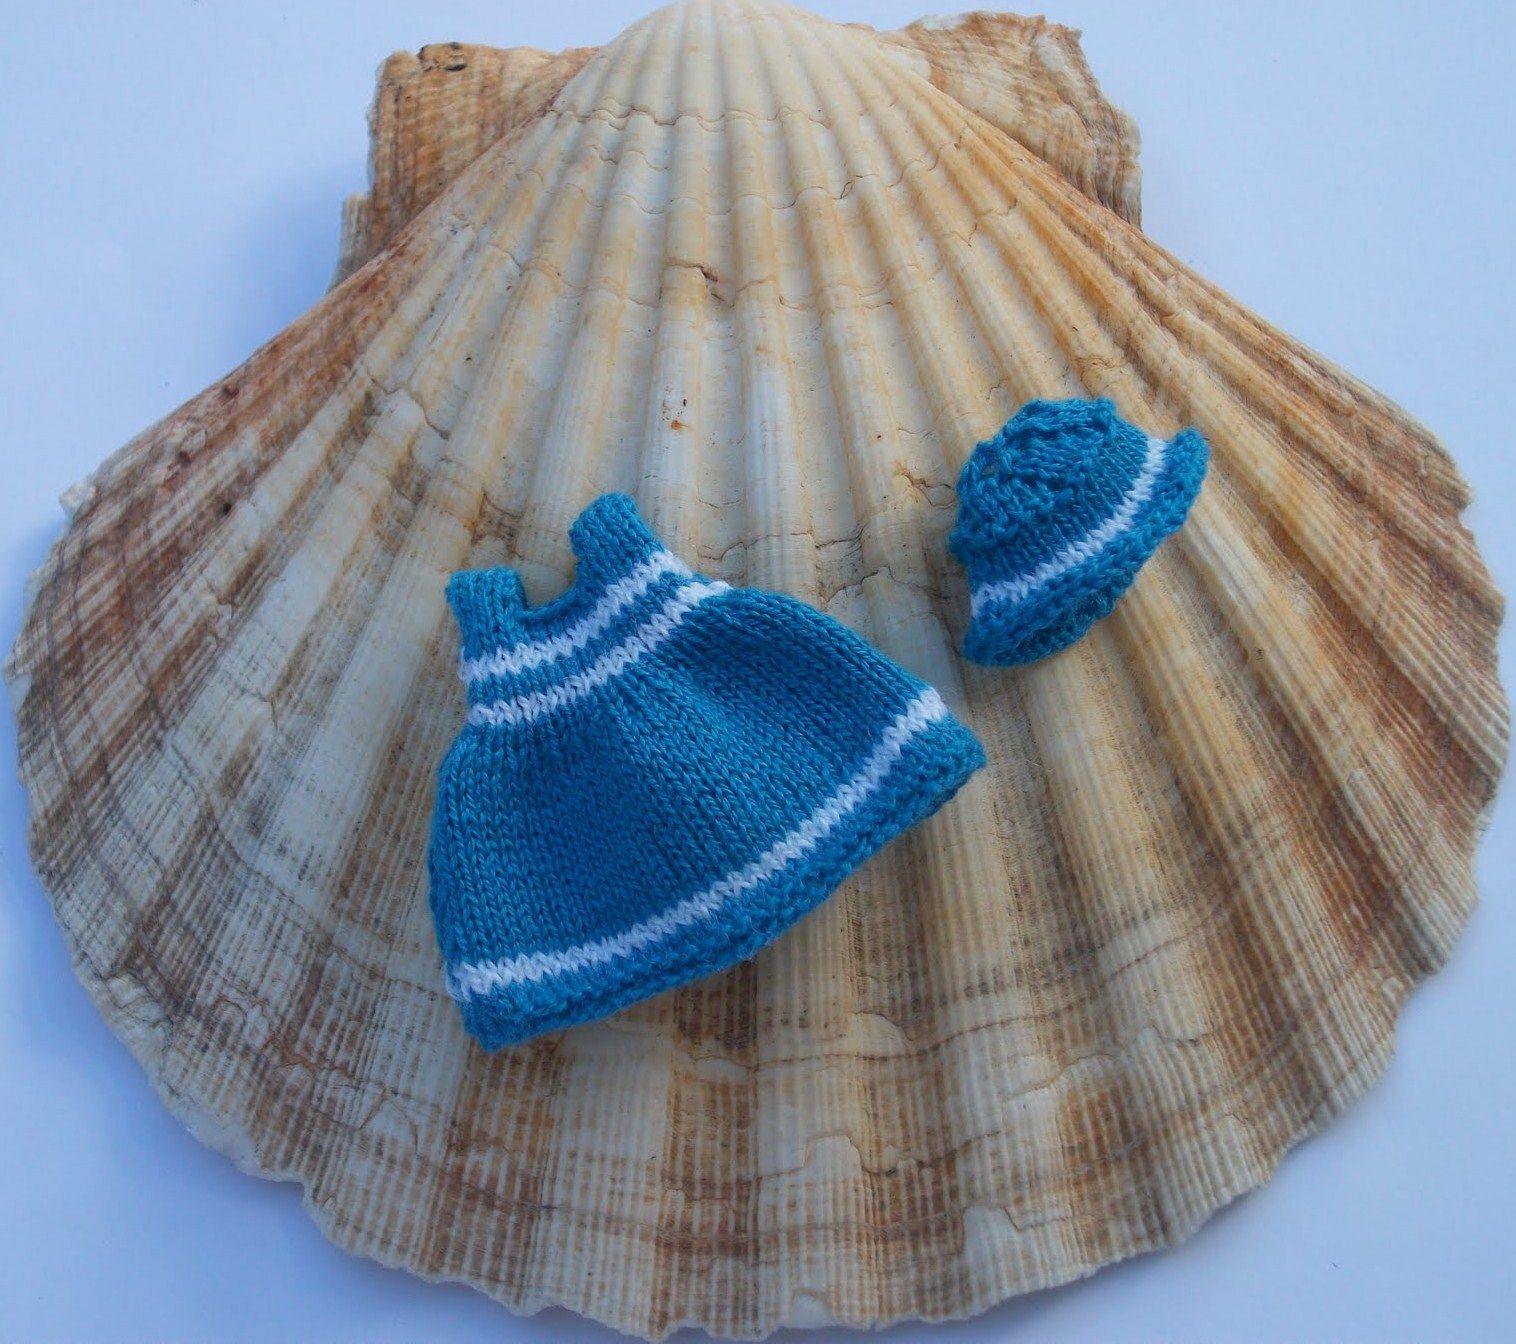 how to: crochet sailor dress (hat tutorial is here: http://minisdeauxi.blogspot.mx/2011/07/sombrerito-playero.html )